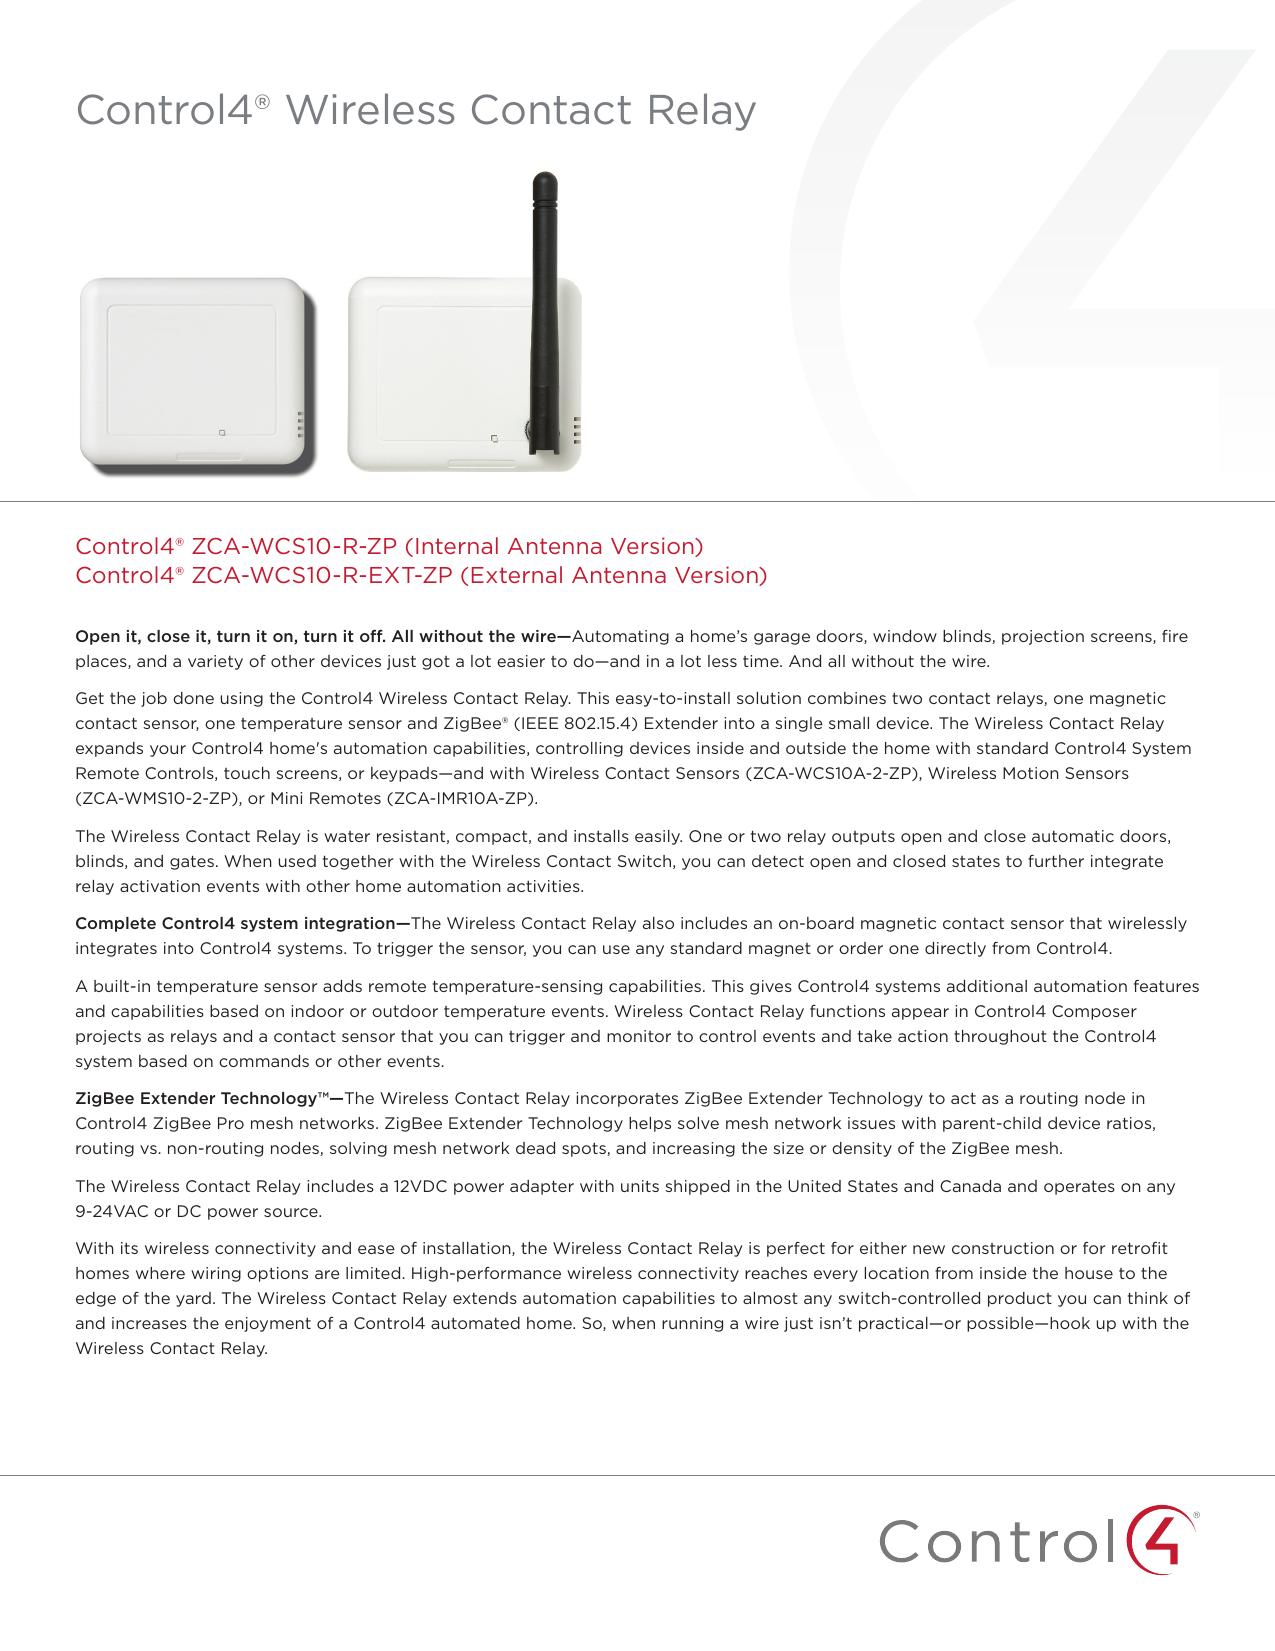 Wireless Contact Relay Data Sheet | manualzz com